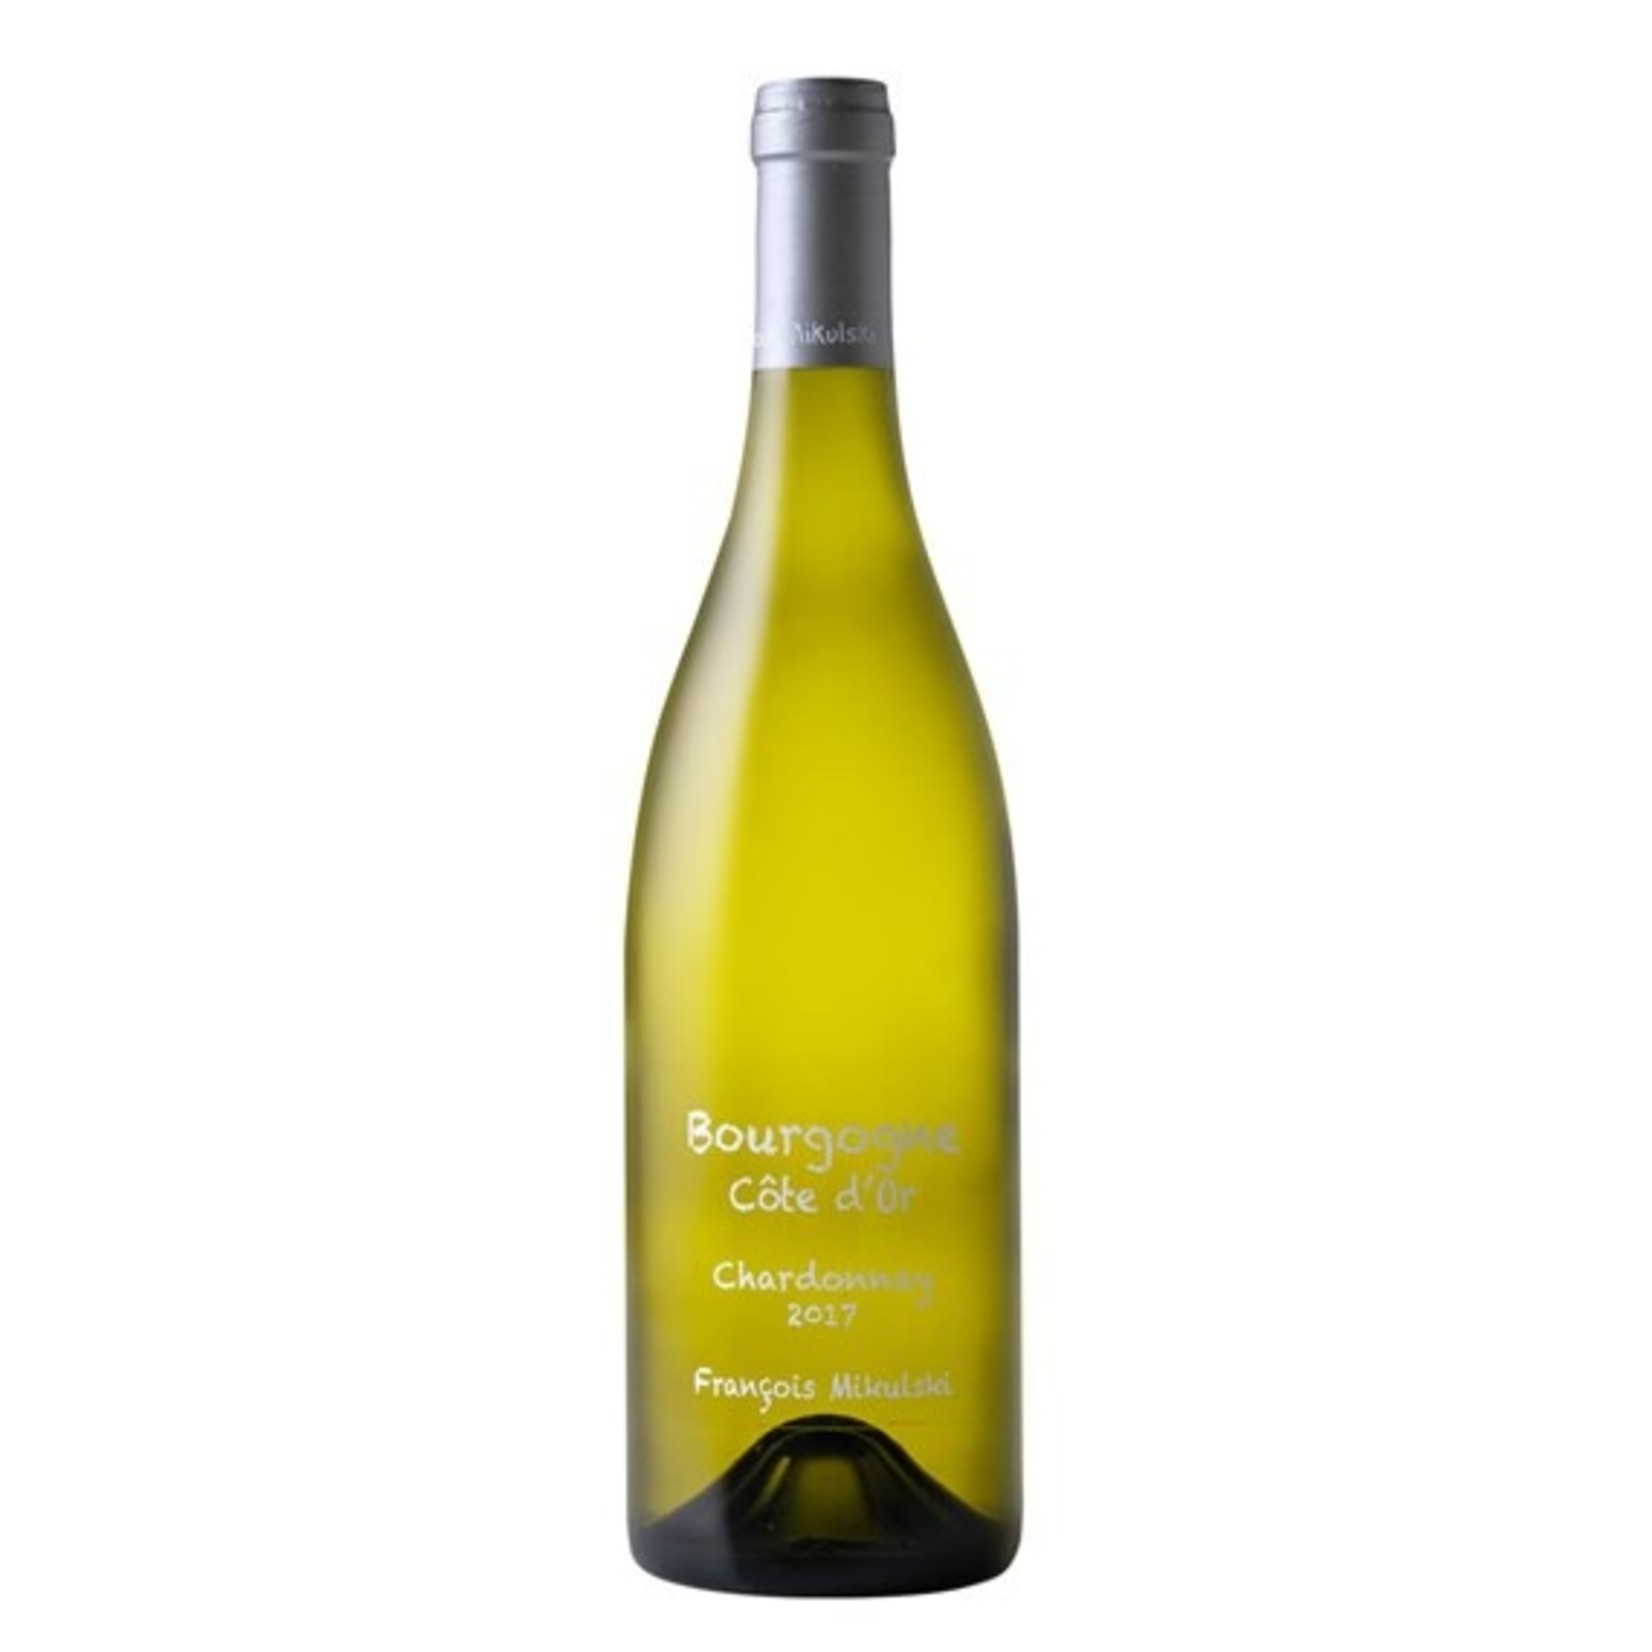 Bourgogne Cote d'Or Blanc, Francois Mikulski, 2017